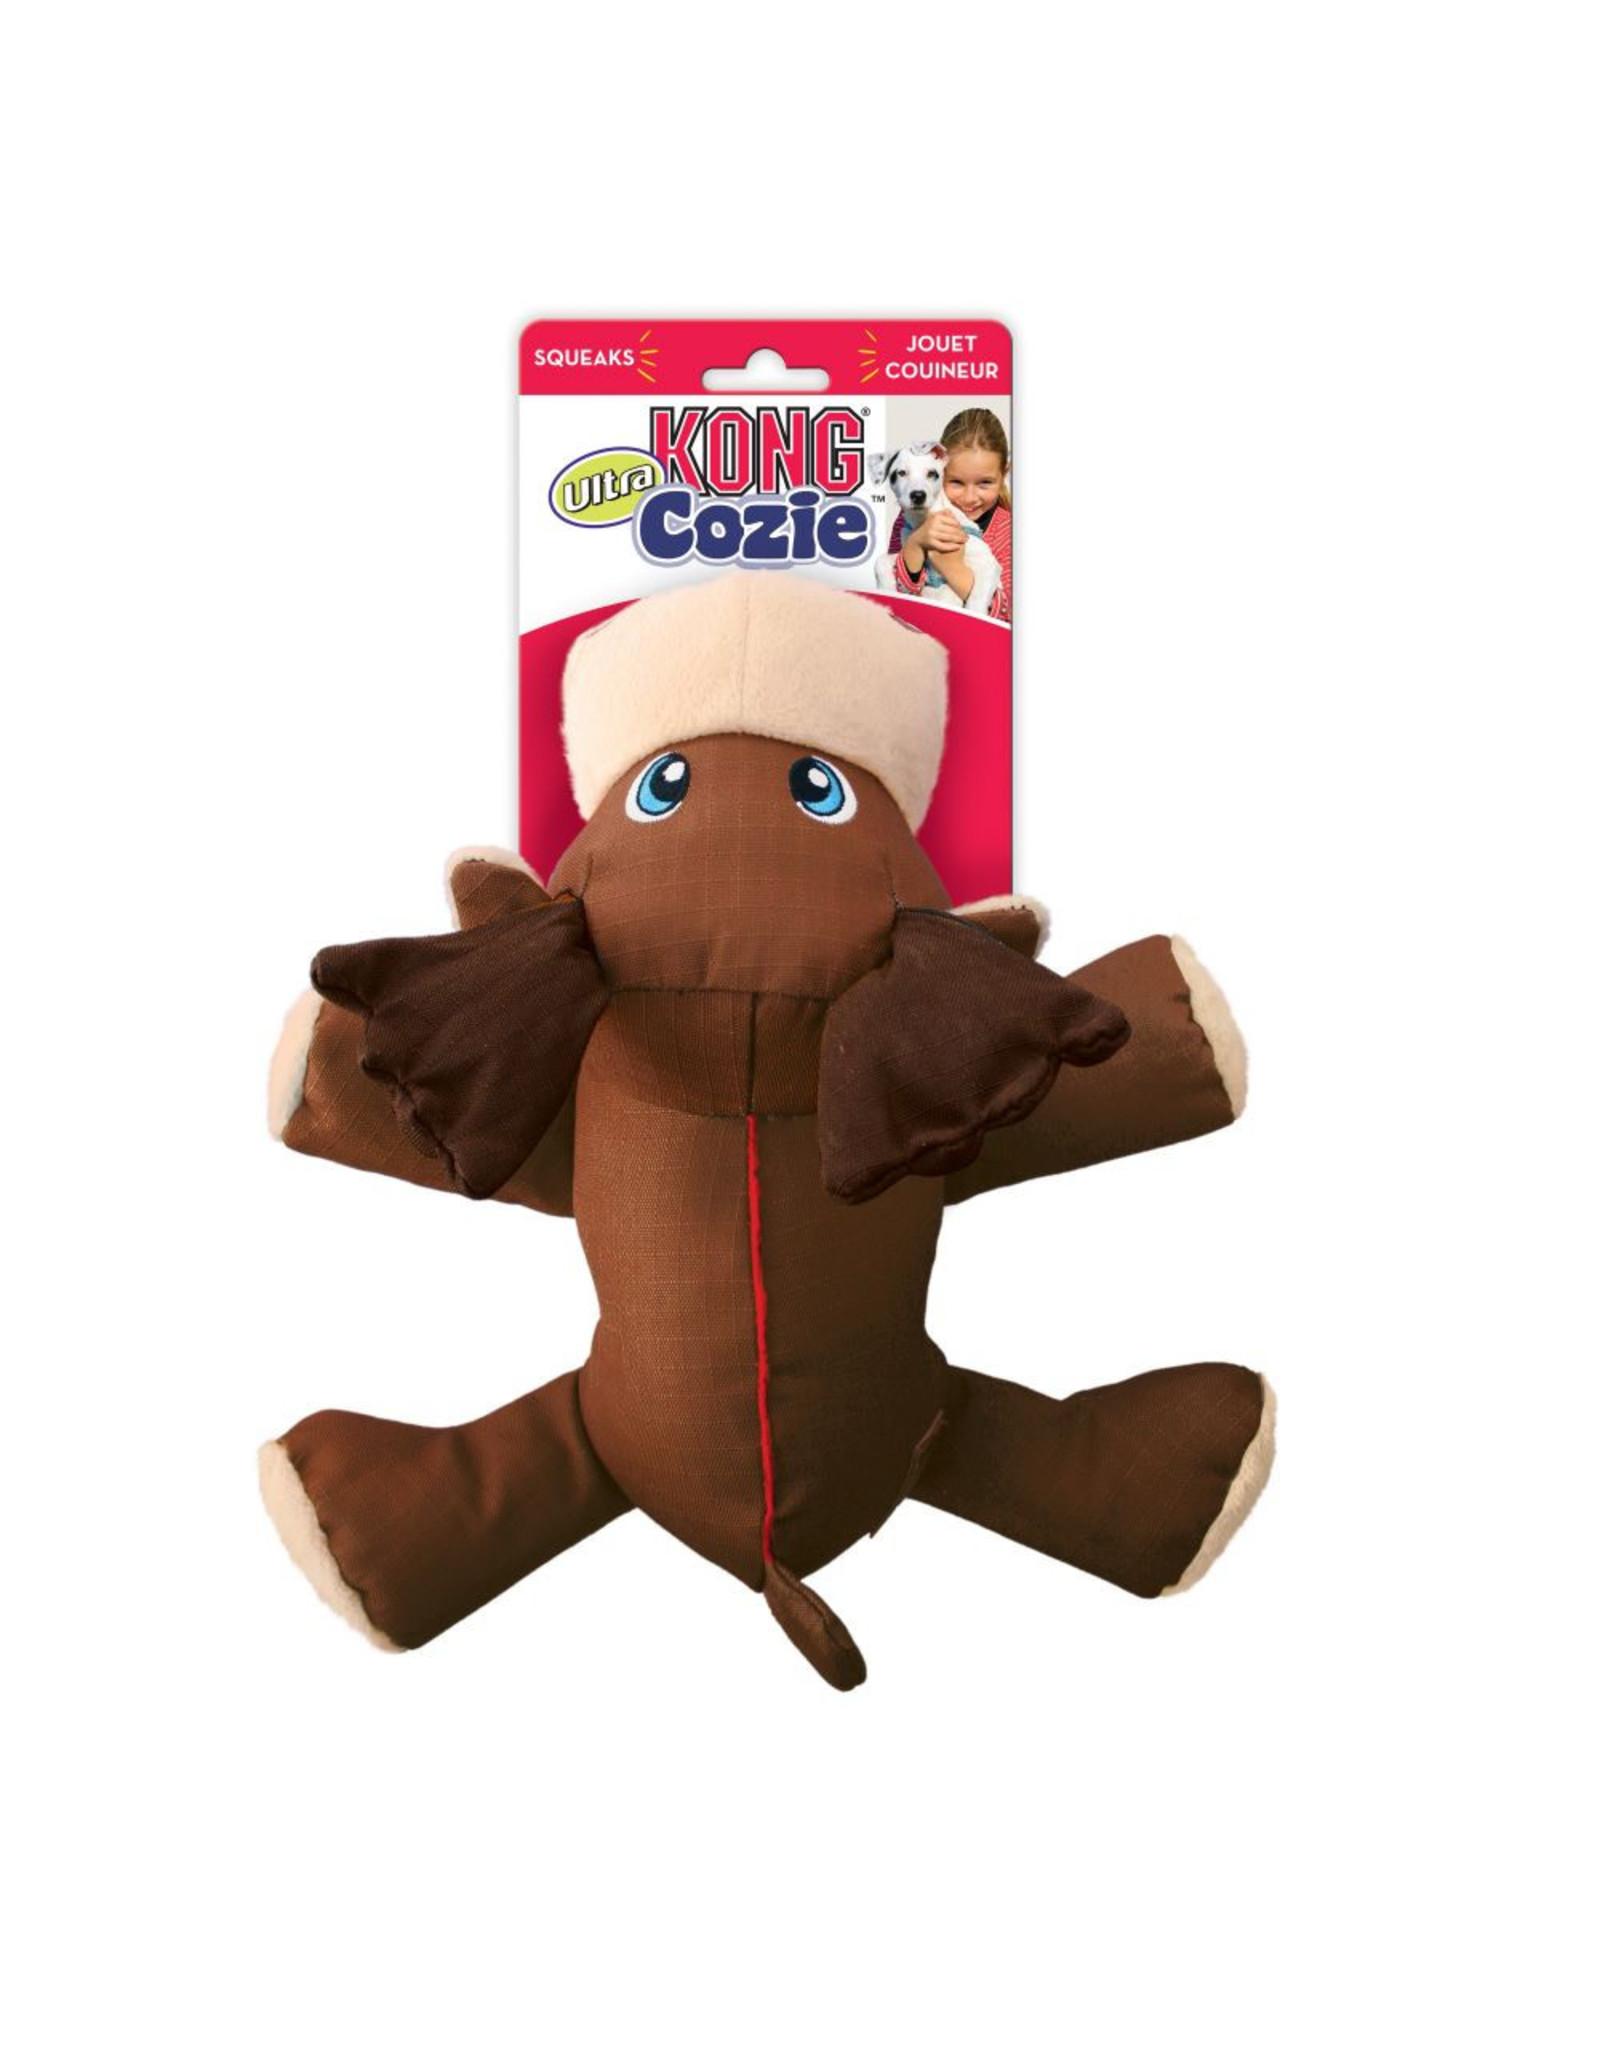 KONG Cozie Ultra Max Moose Plush Dog Toy, Medium